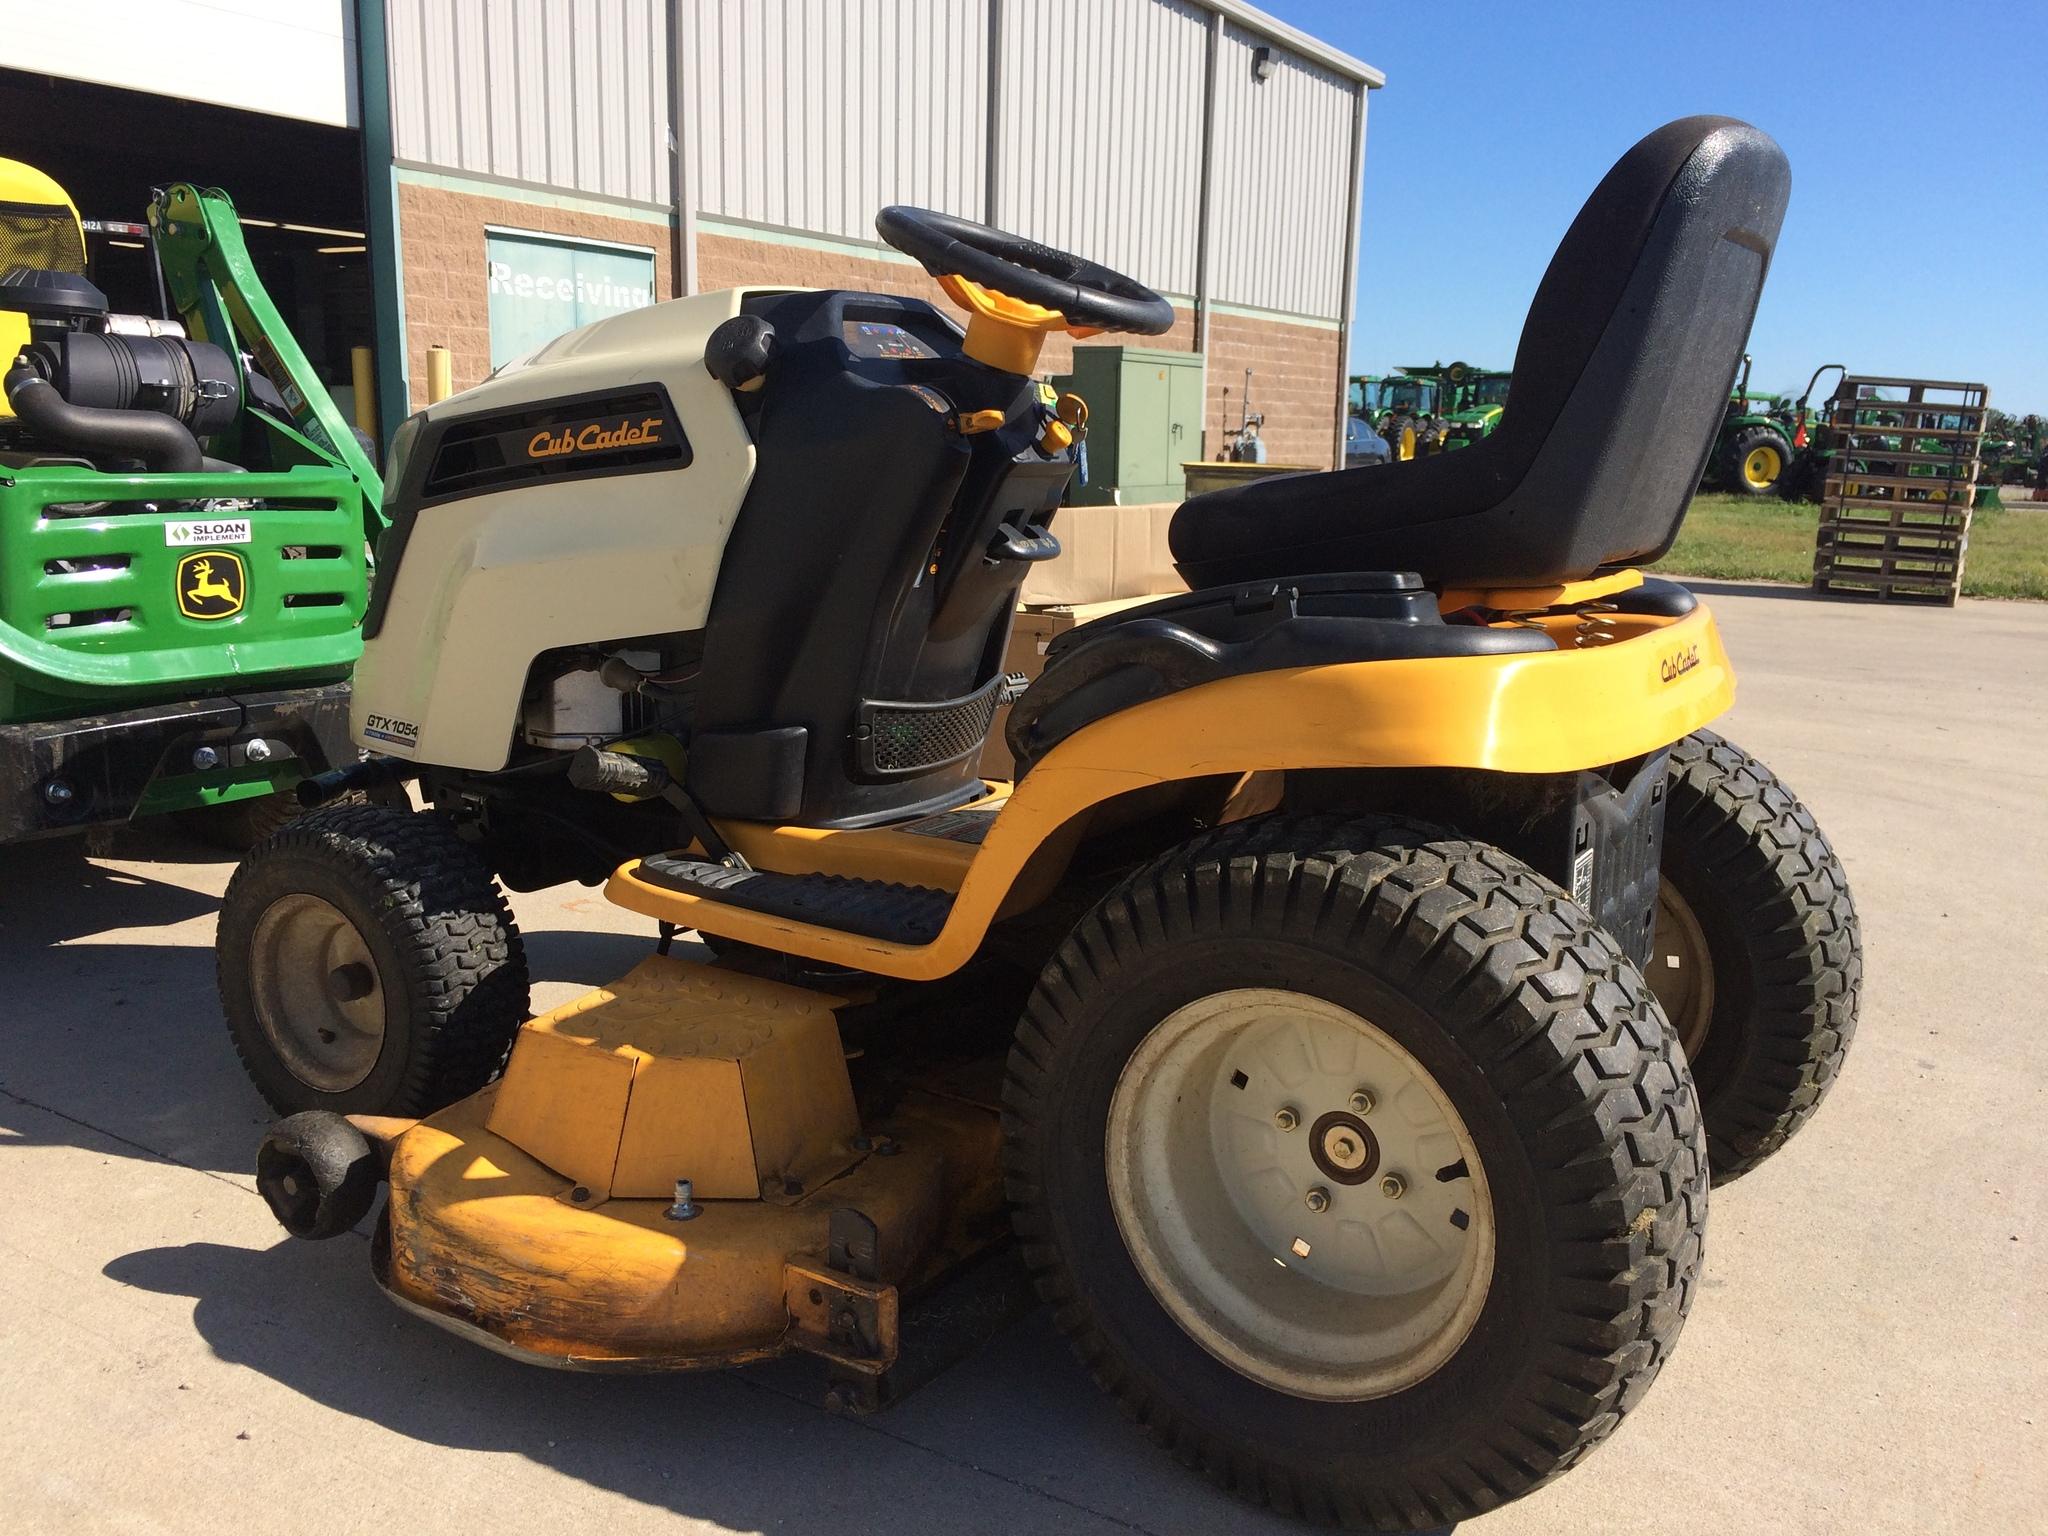 Cub Cadet Gtx1054 Lawn Garden Tractors For Sale 63385